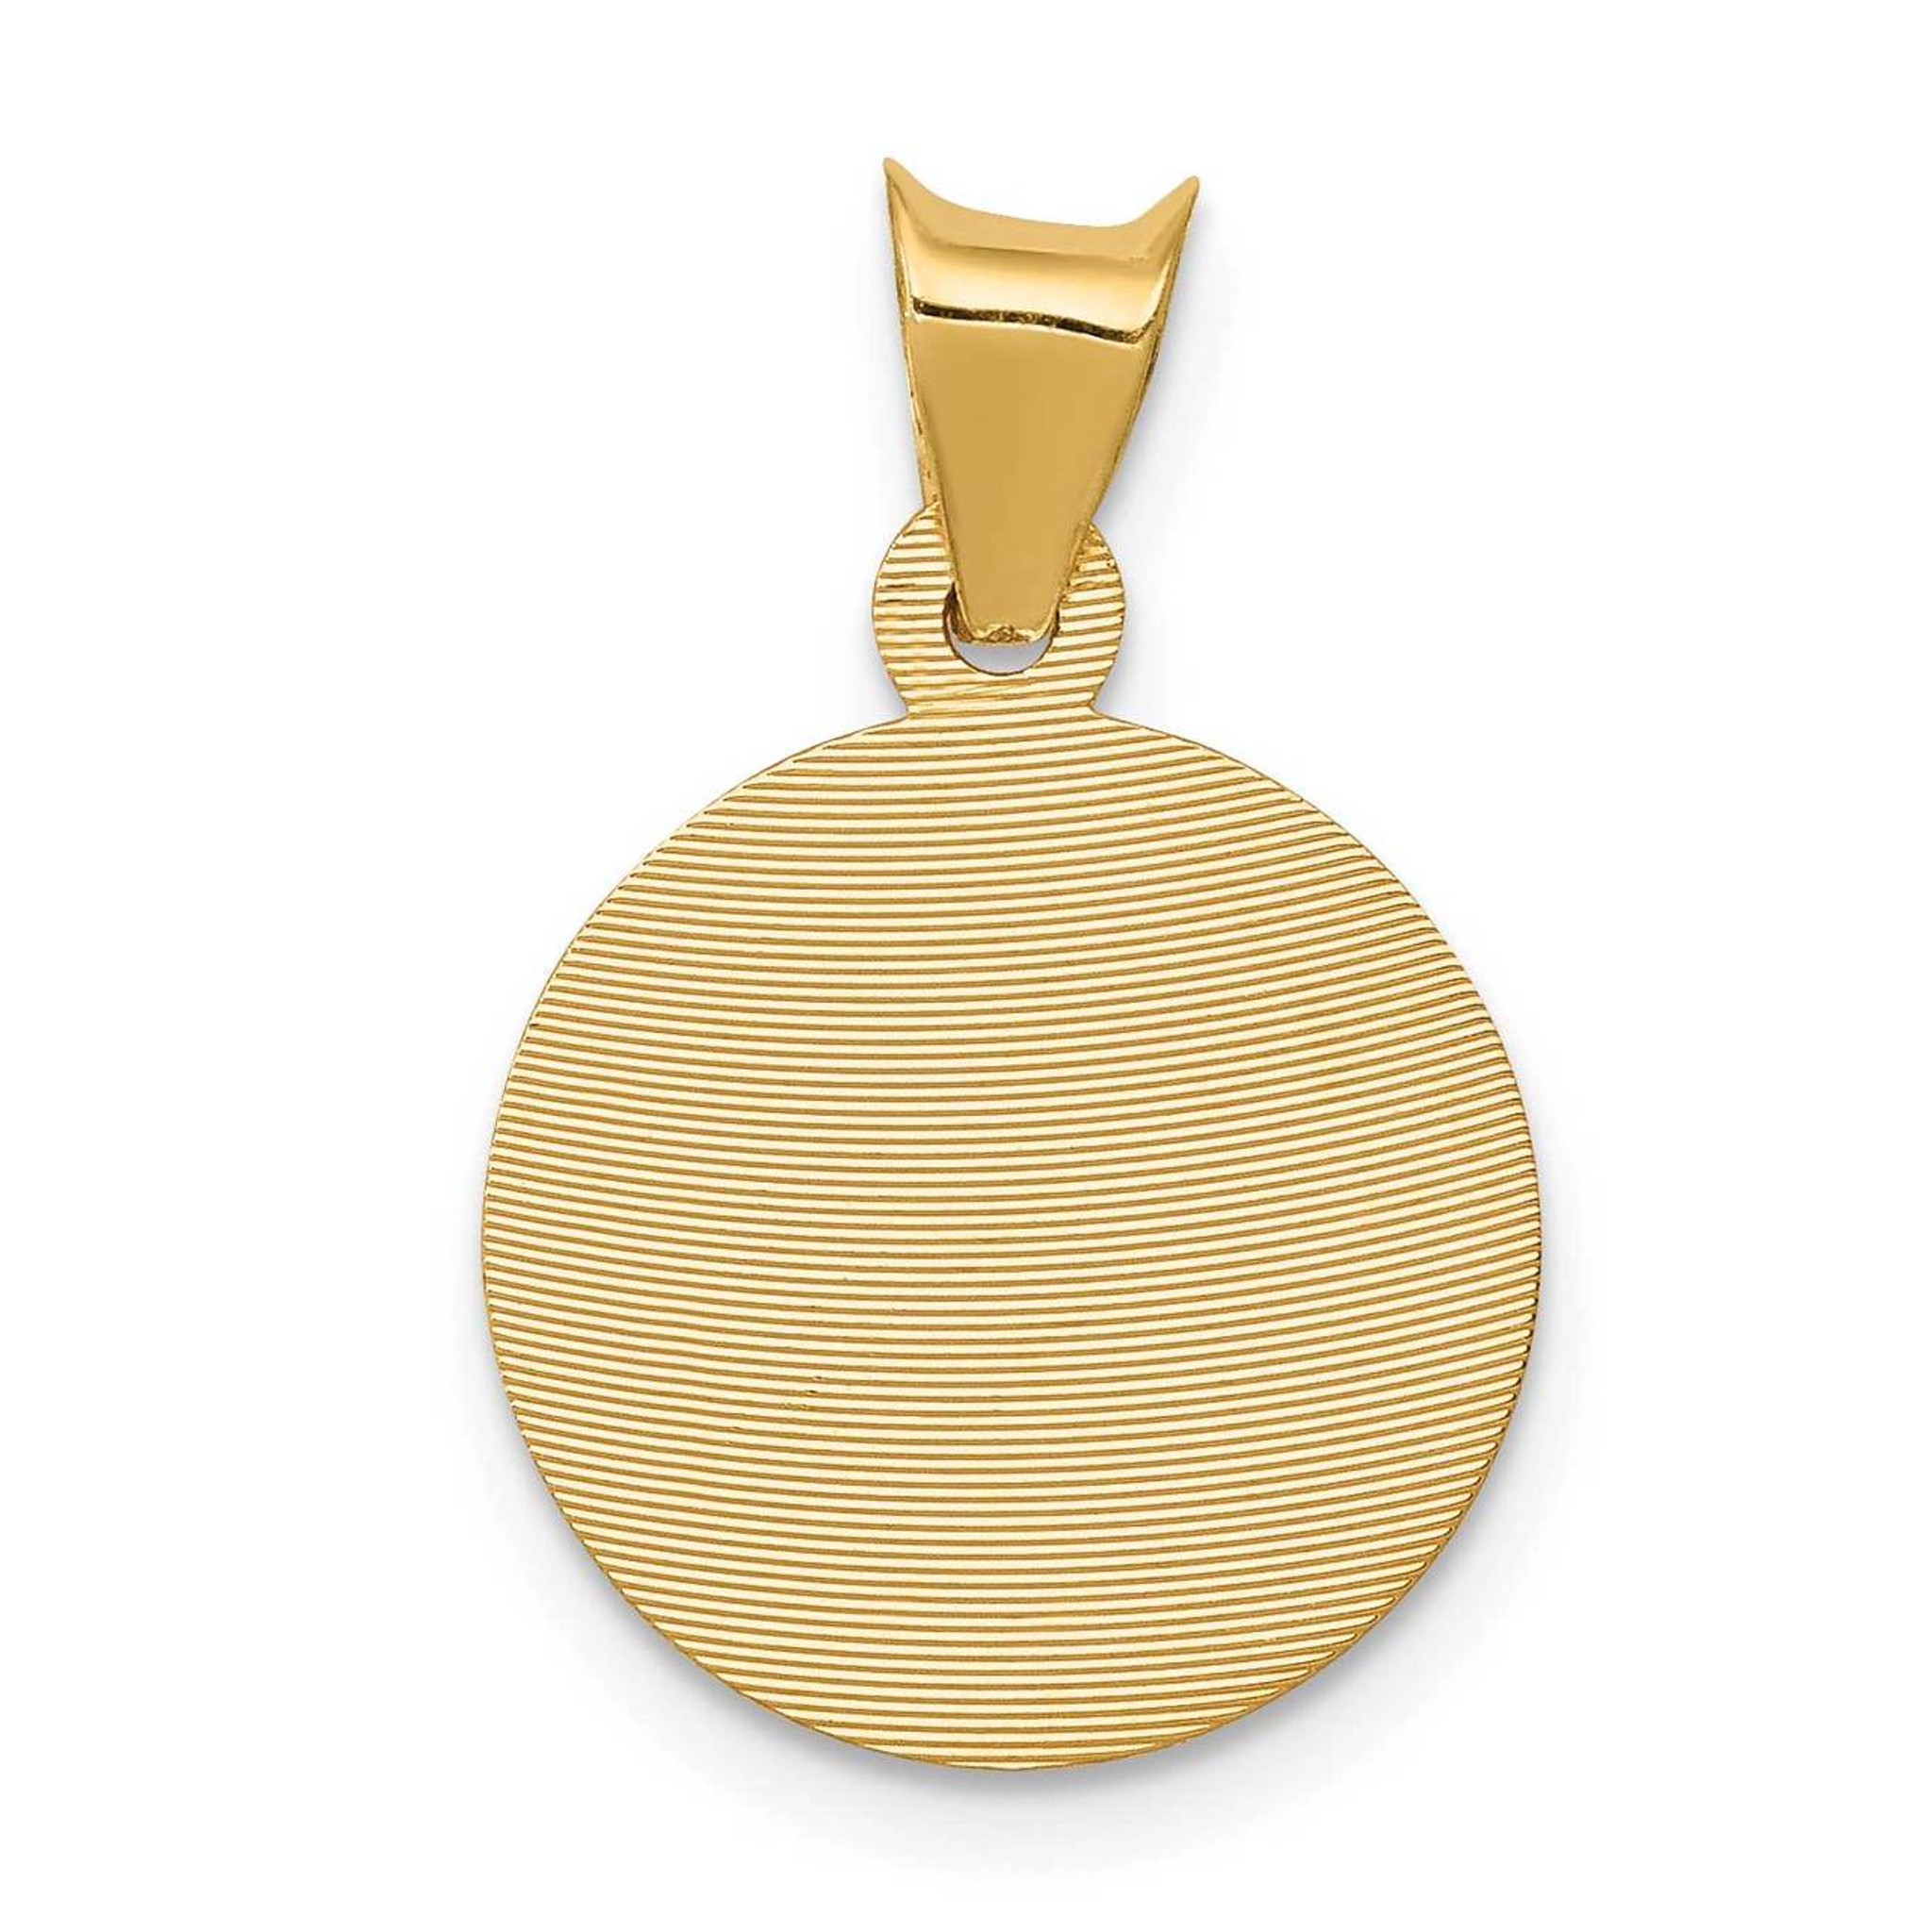 14K Yellow Gold and Rhodium Polished and Diamond-cut Baptism Circle Pendant